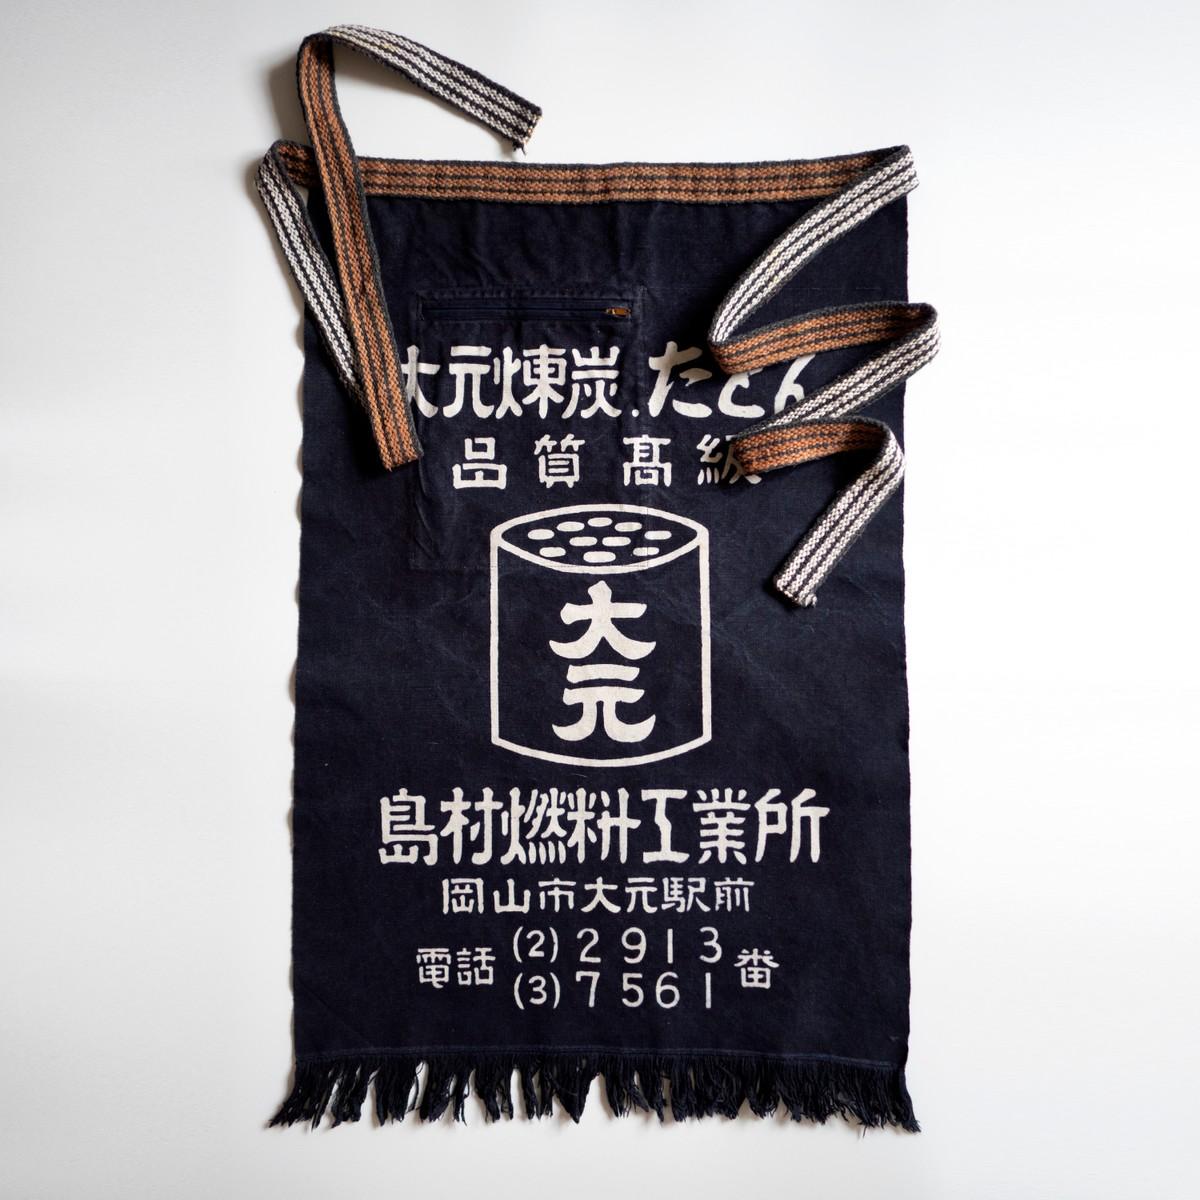 Photo of Vintage Maekake Apron: Tinned